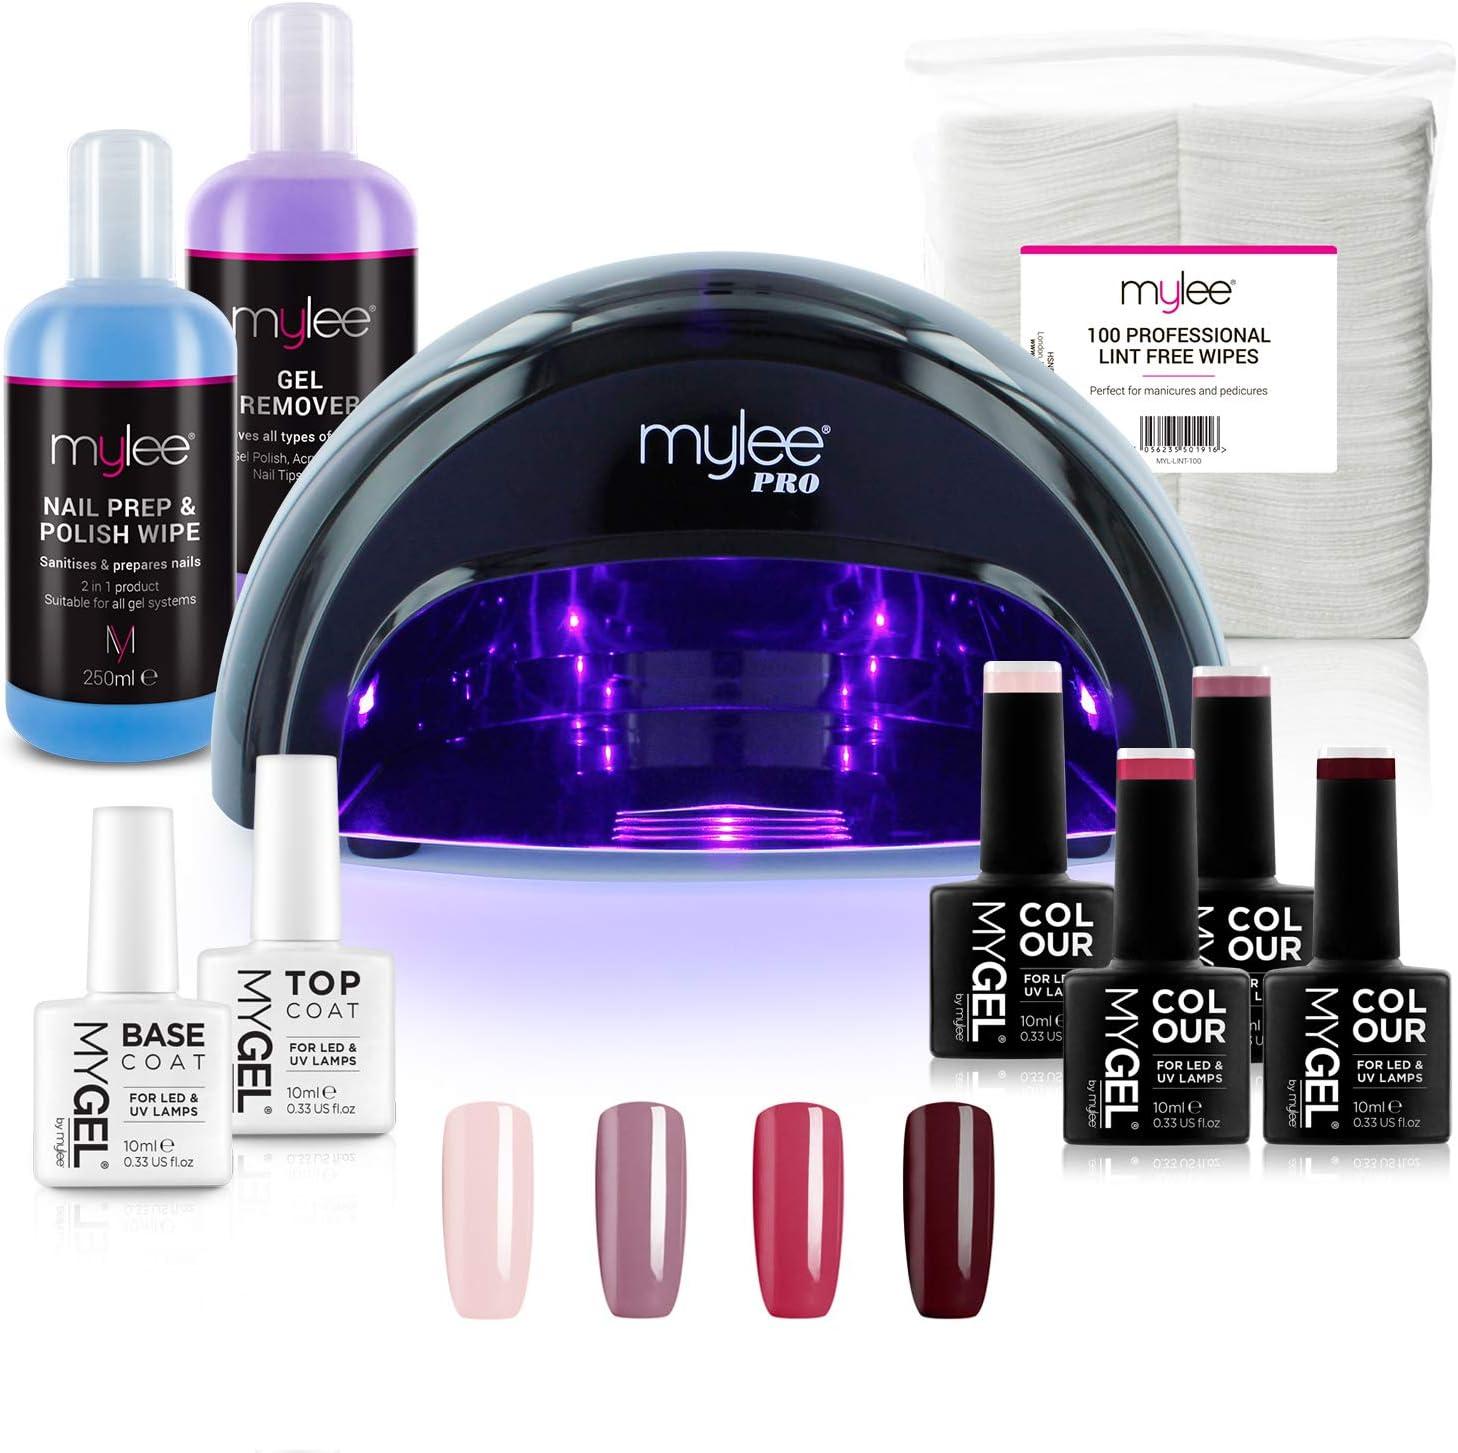 Kit Profesional LED Mylee para barniz de uñas, 4x colores MYGEL, capa superior e inferior, lámpara LED de curado convexo Mylee PRO Series, Prep & Wipe, removedor de gel (Negro)